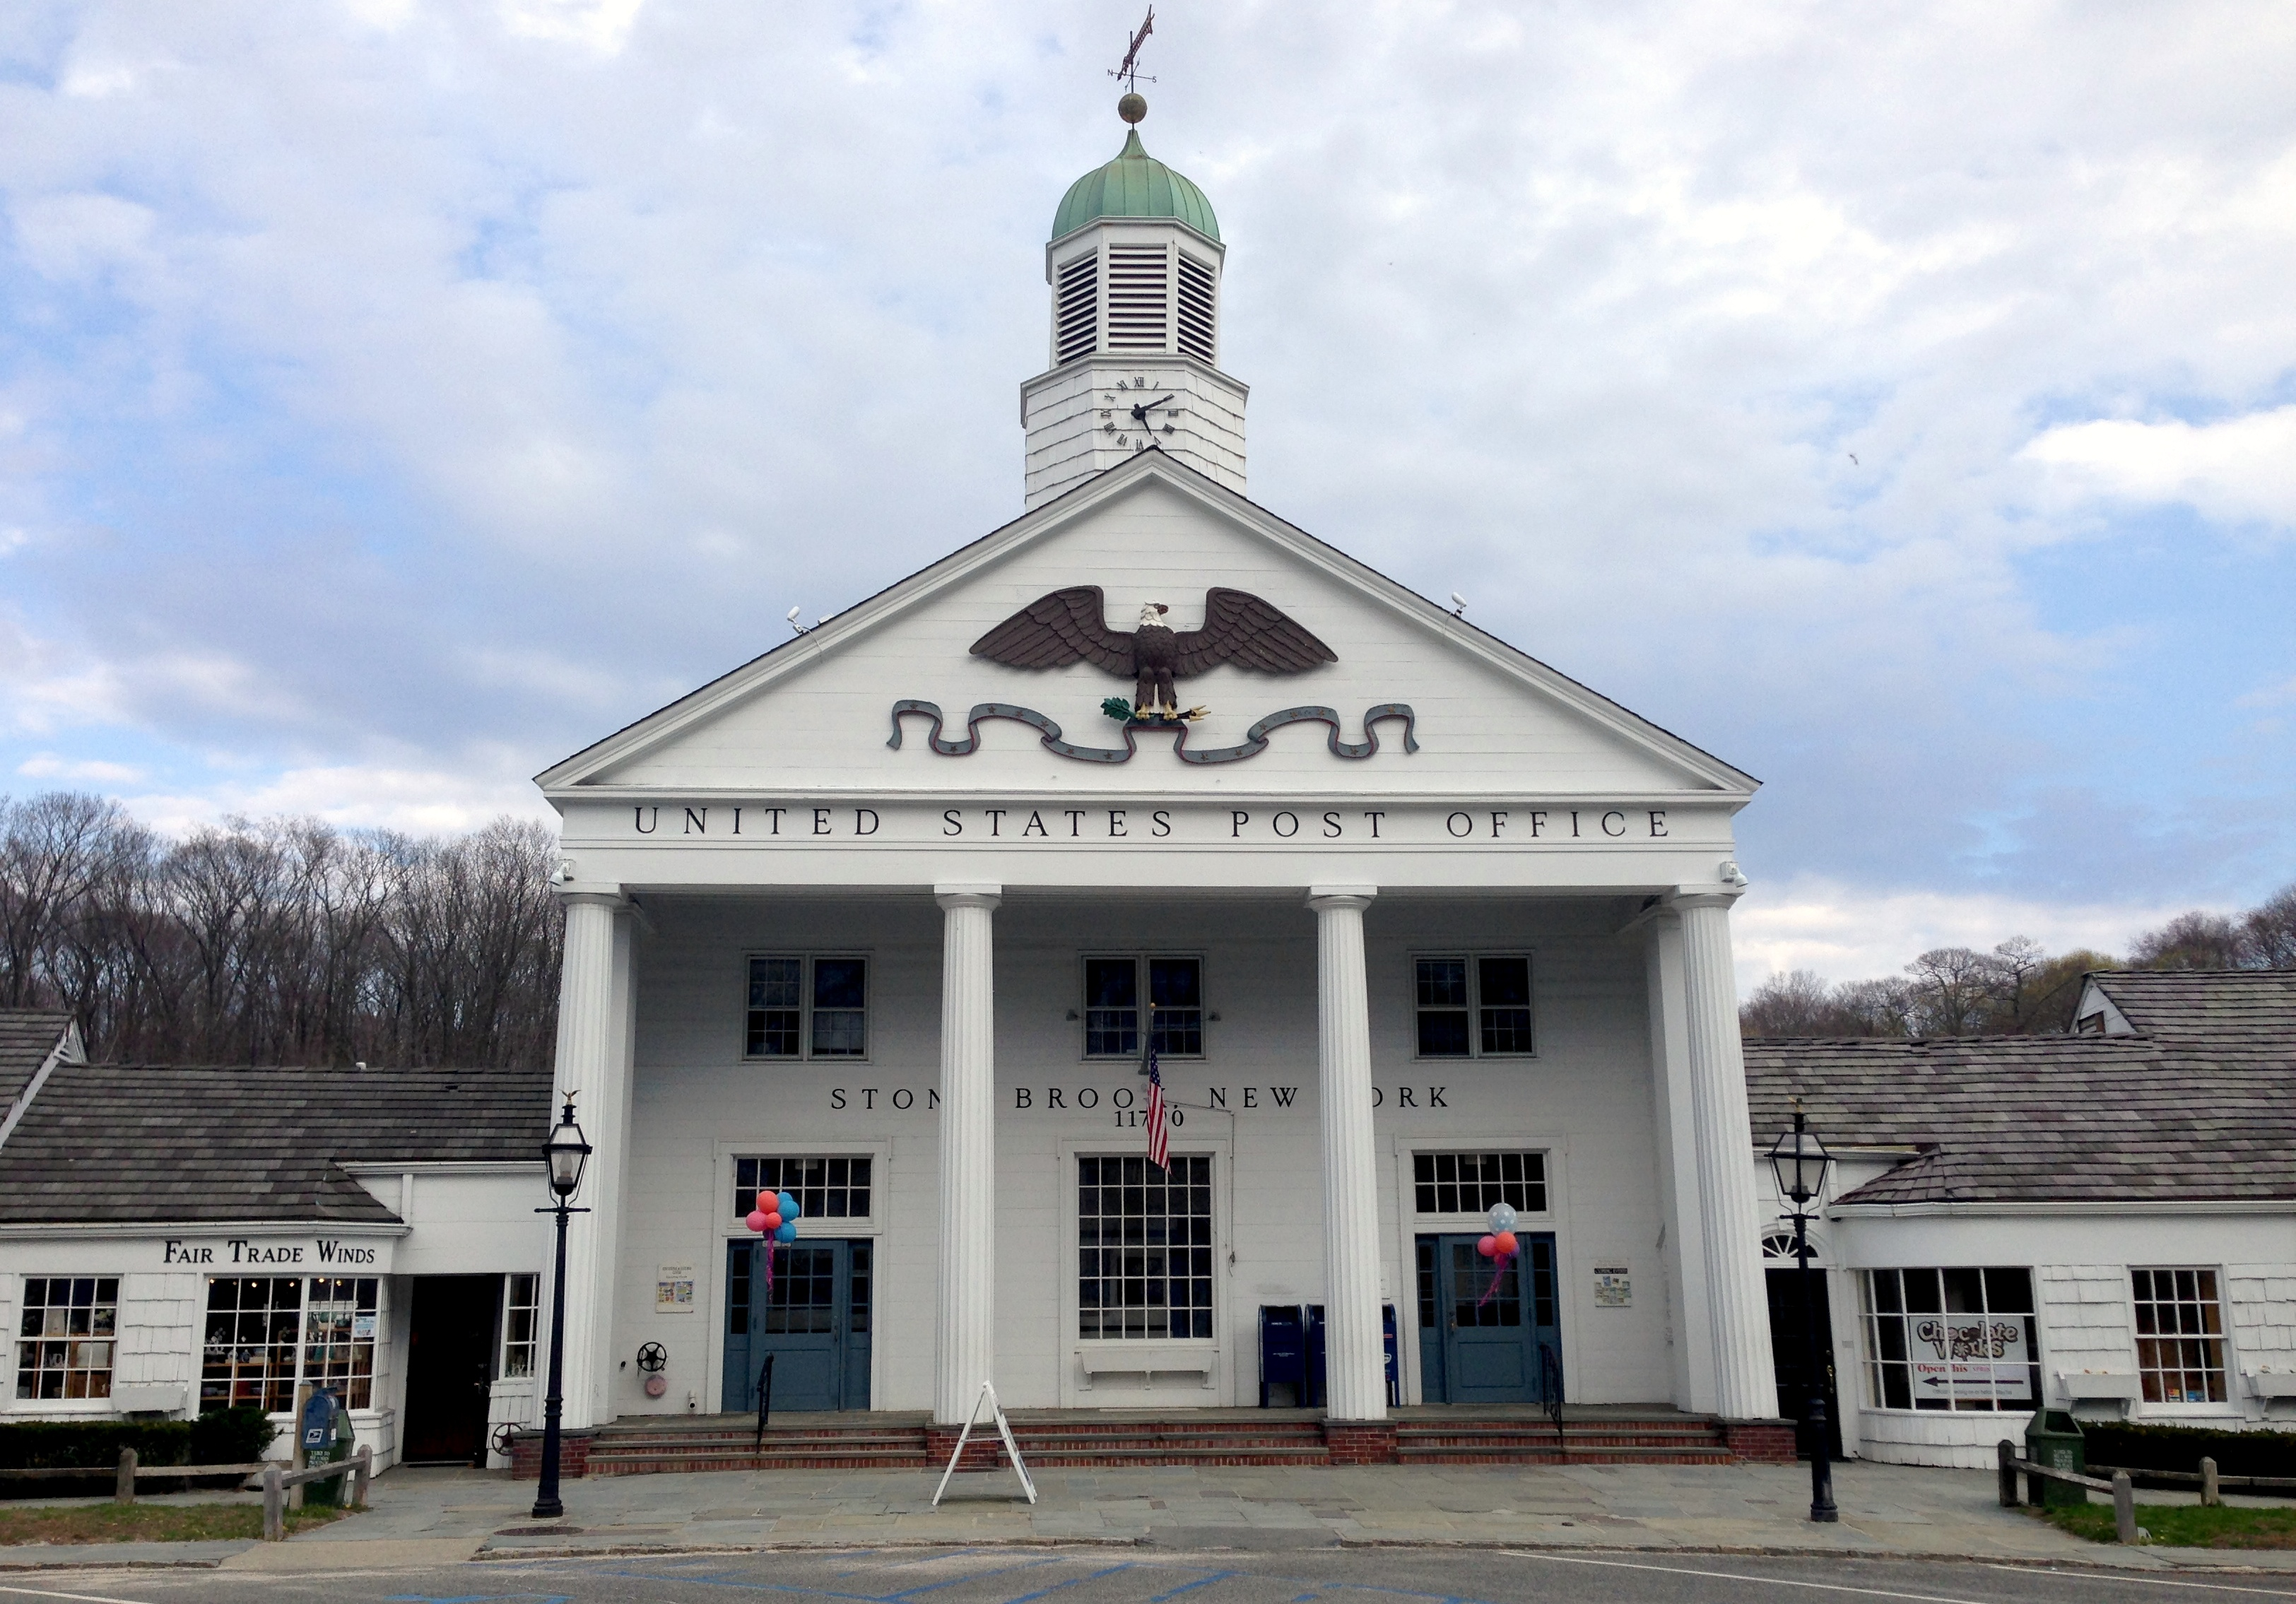 Stony Brook Village Center - Wikipedia